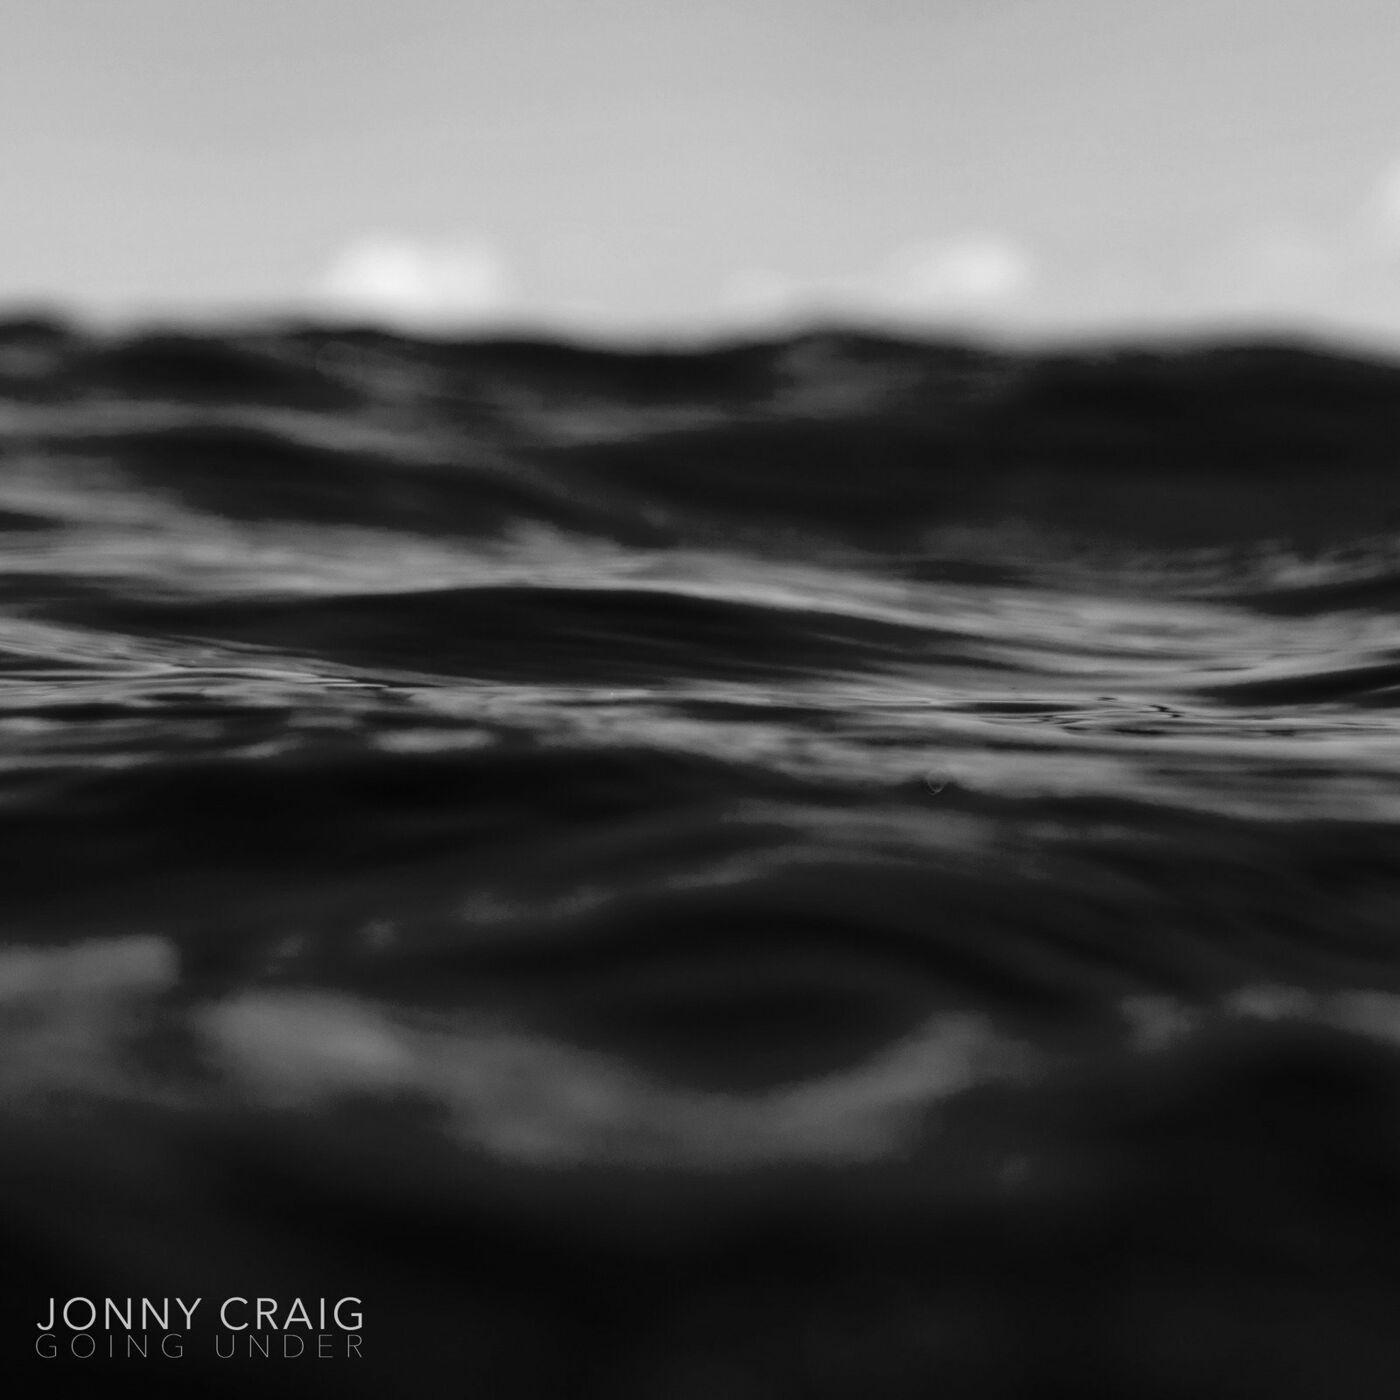 Jonny Craig - Going Under [single] (2021)